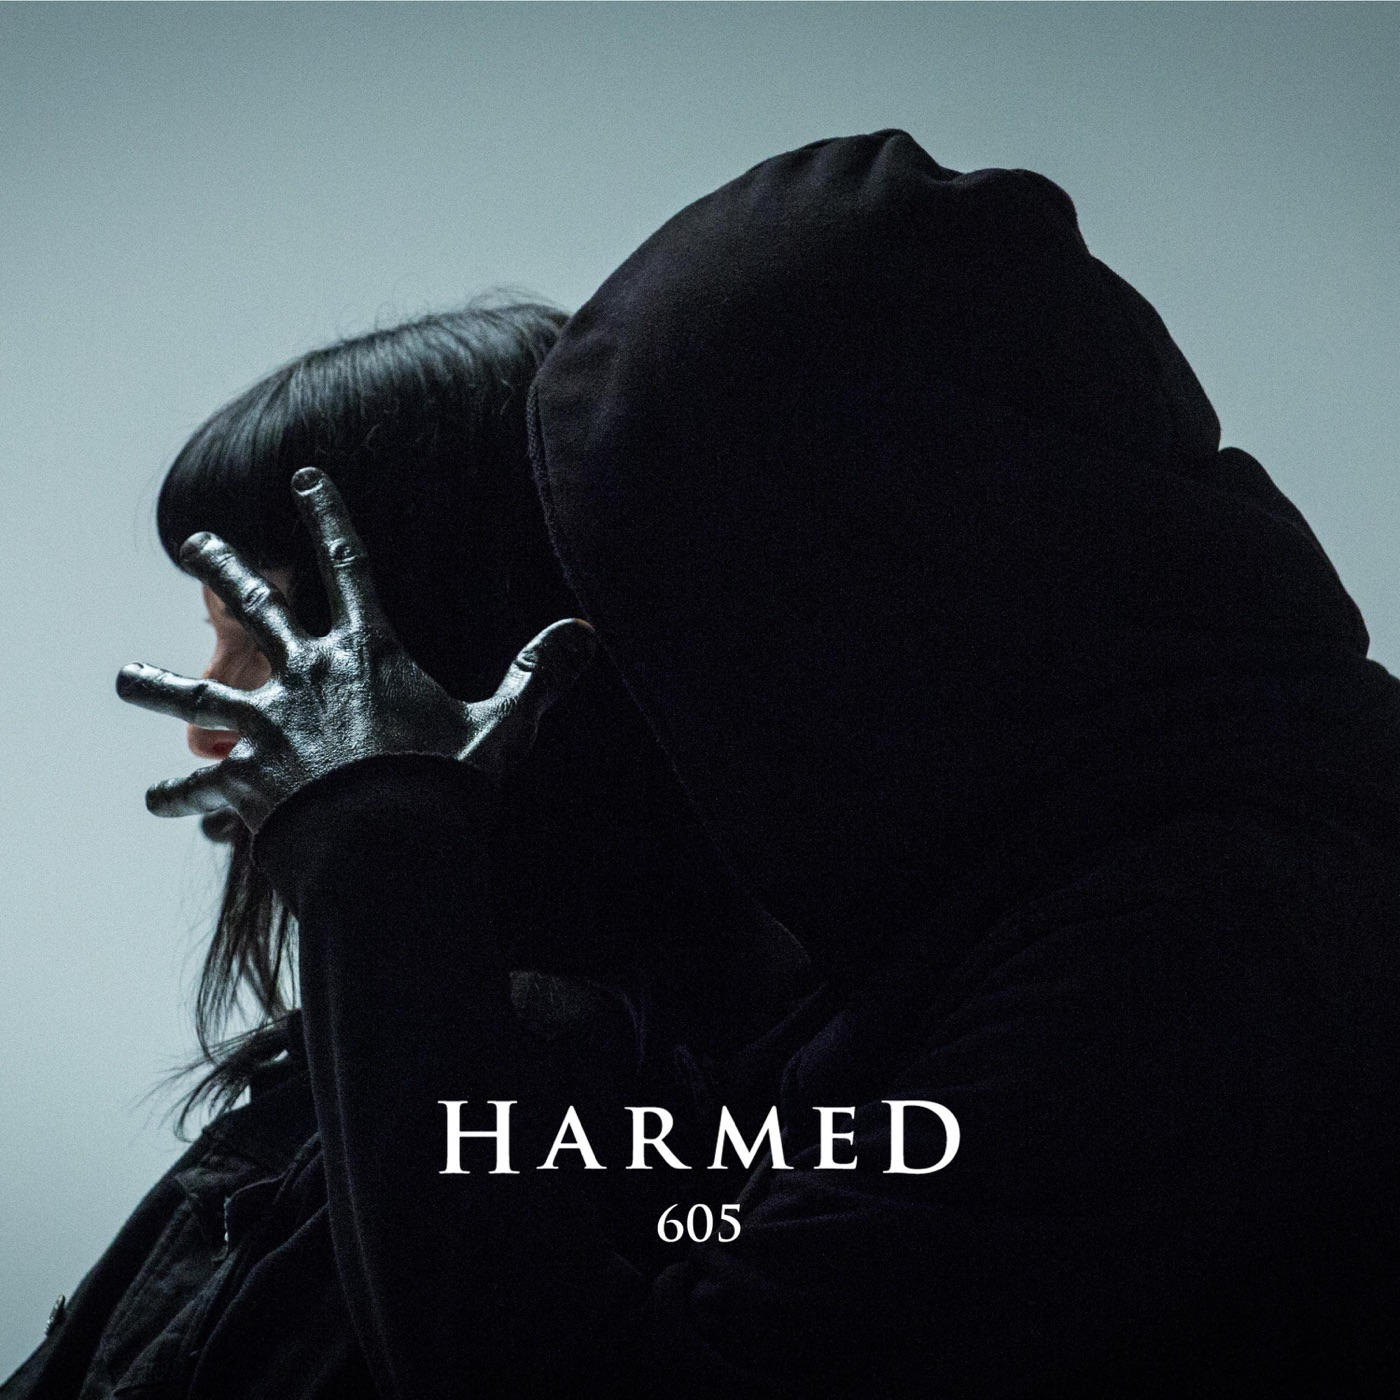 Harmed - 605 [single] (2017)